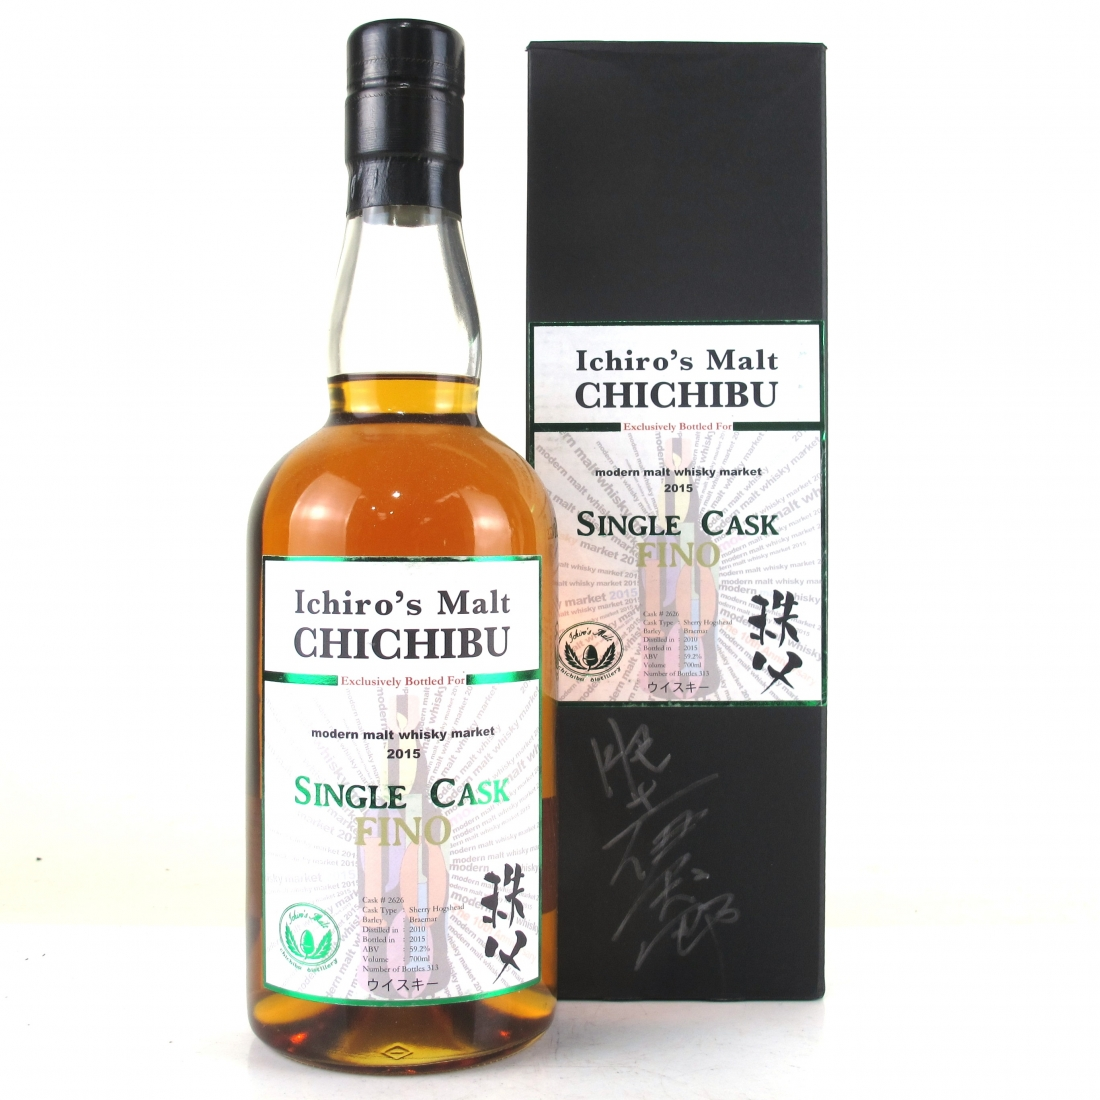 Chichibu 2010 Ichiro's Malt Single Cask #2626 / Modern Malt Whisky Market Signed